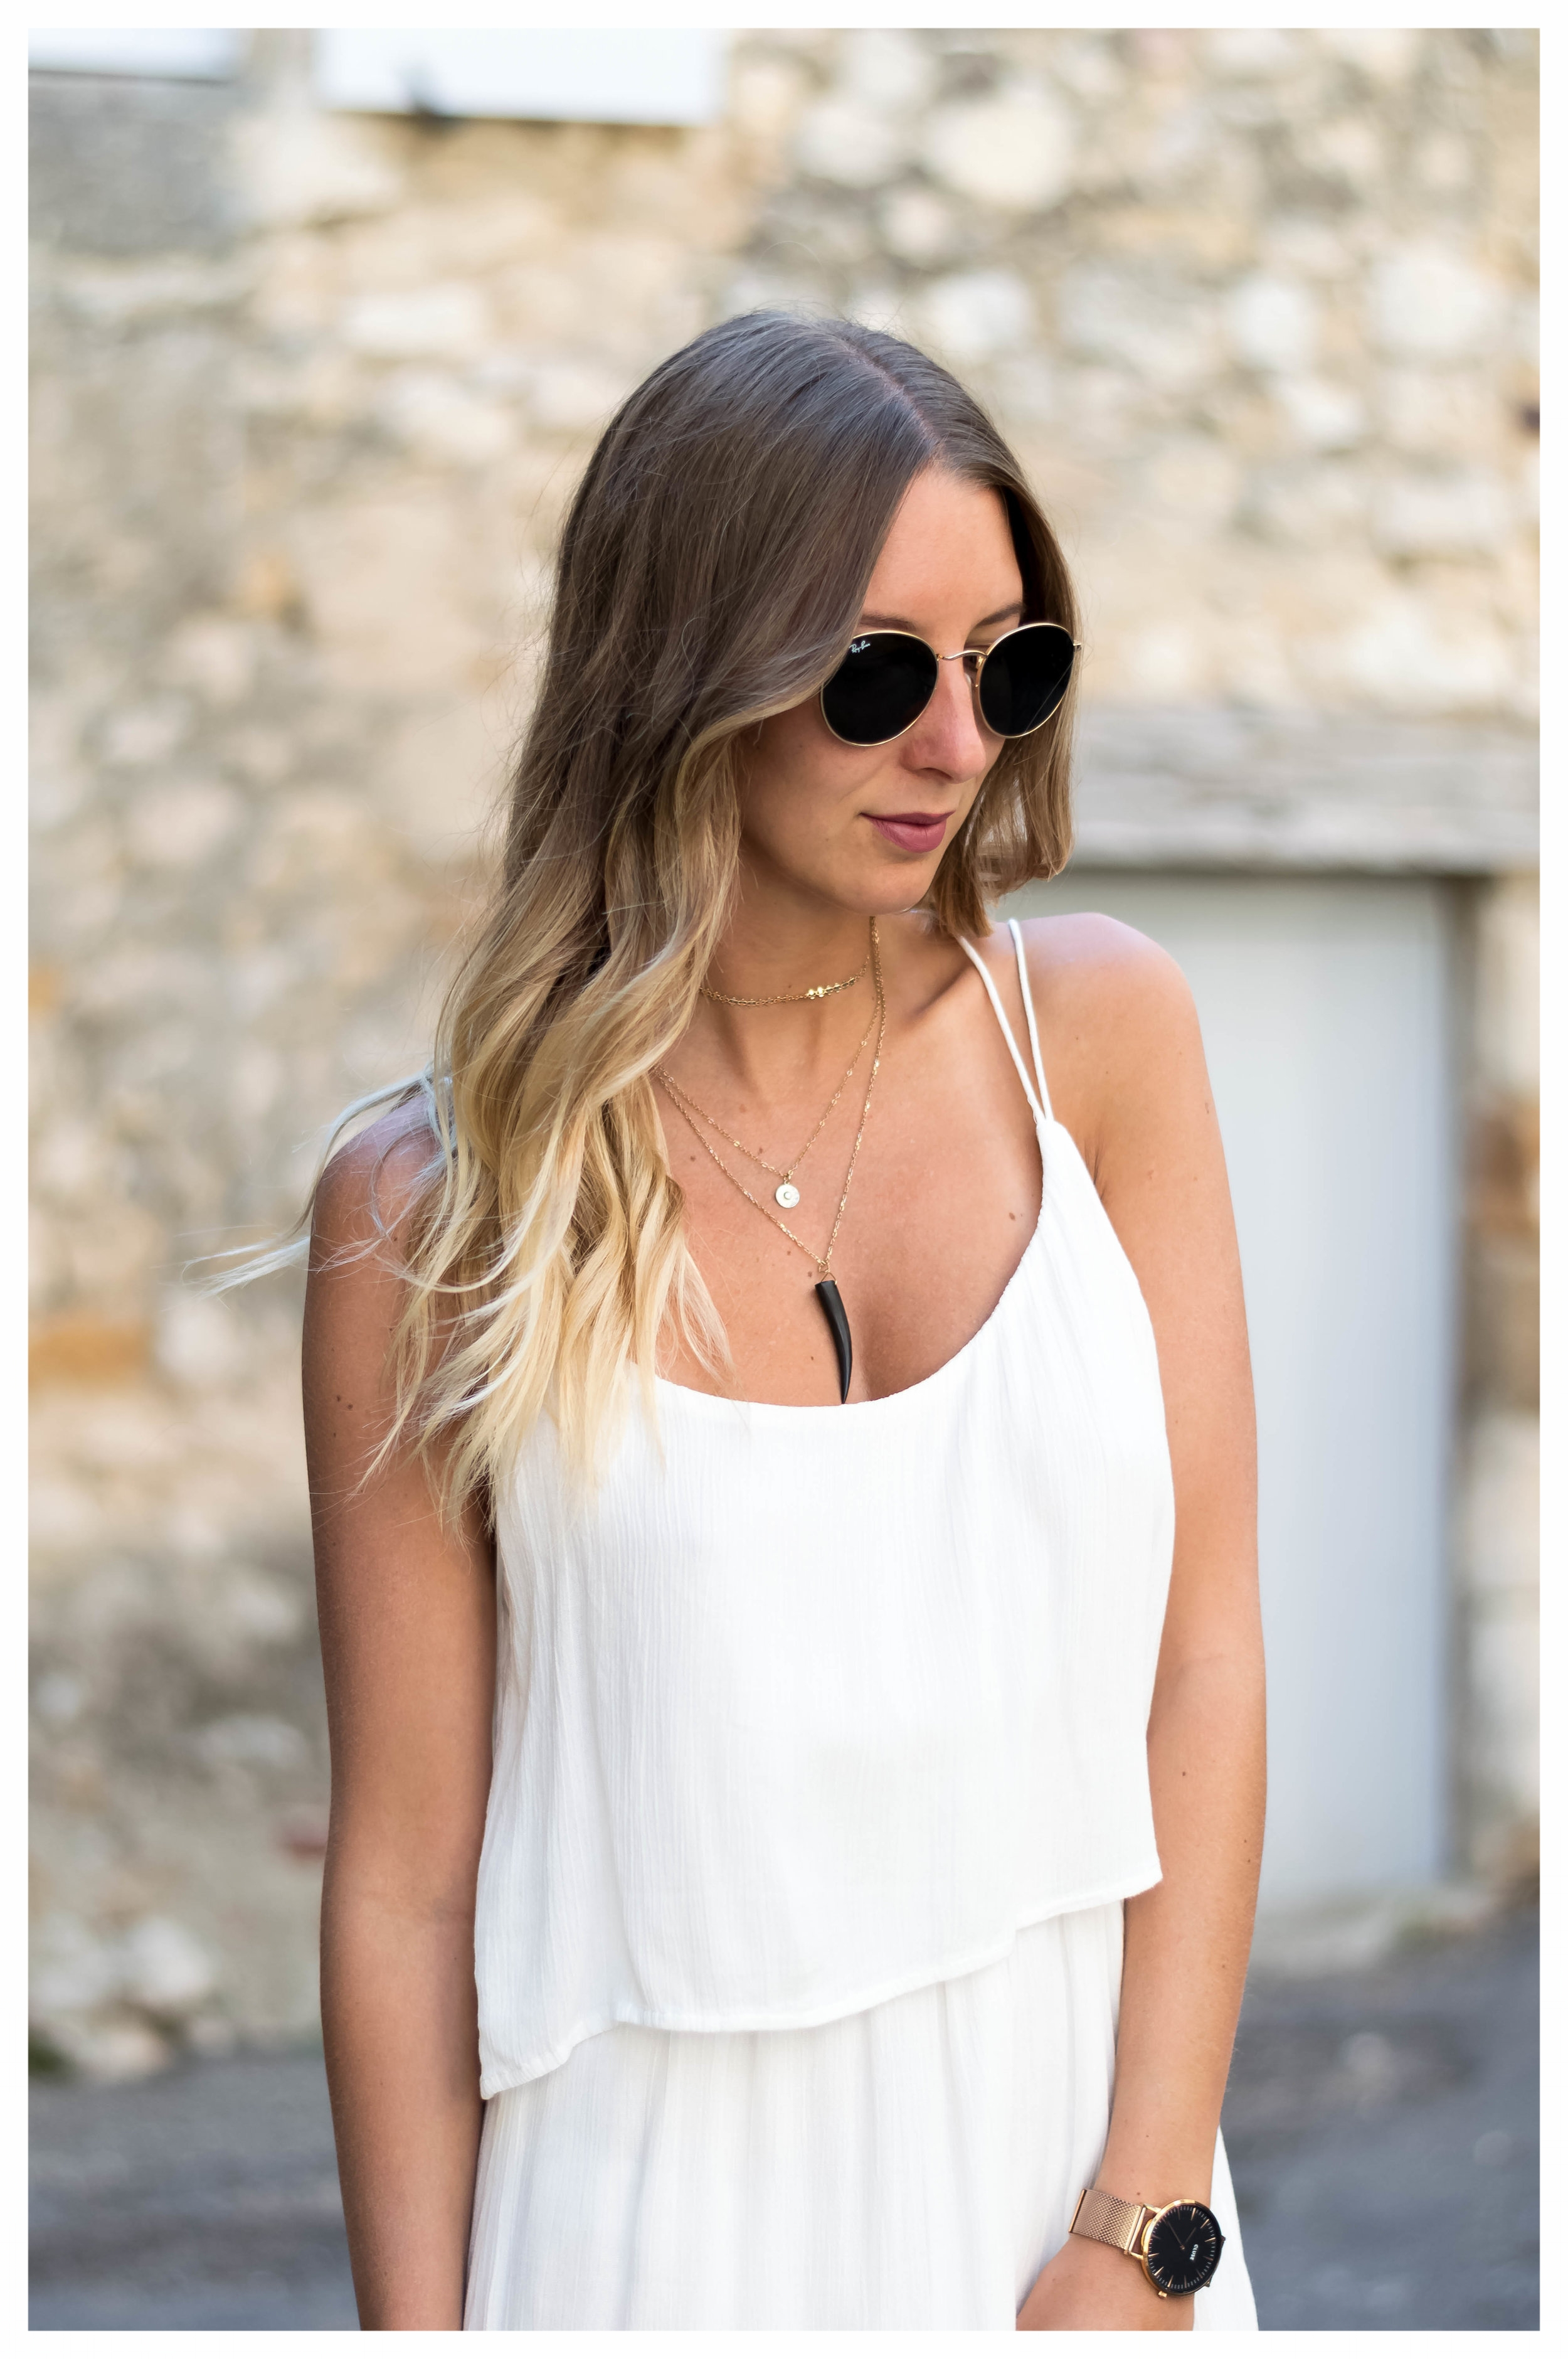 White Dress - OSIARAH.COM (7 sur 16).jpg